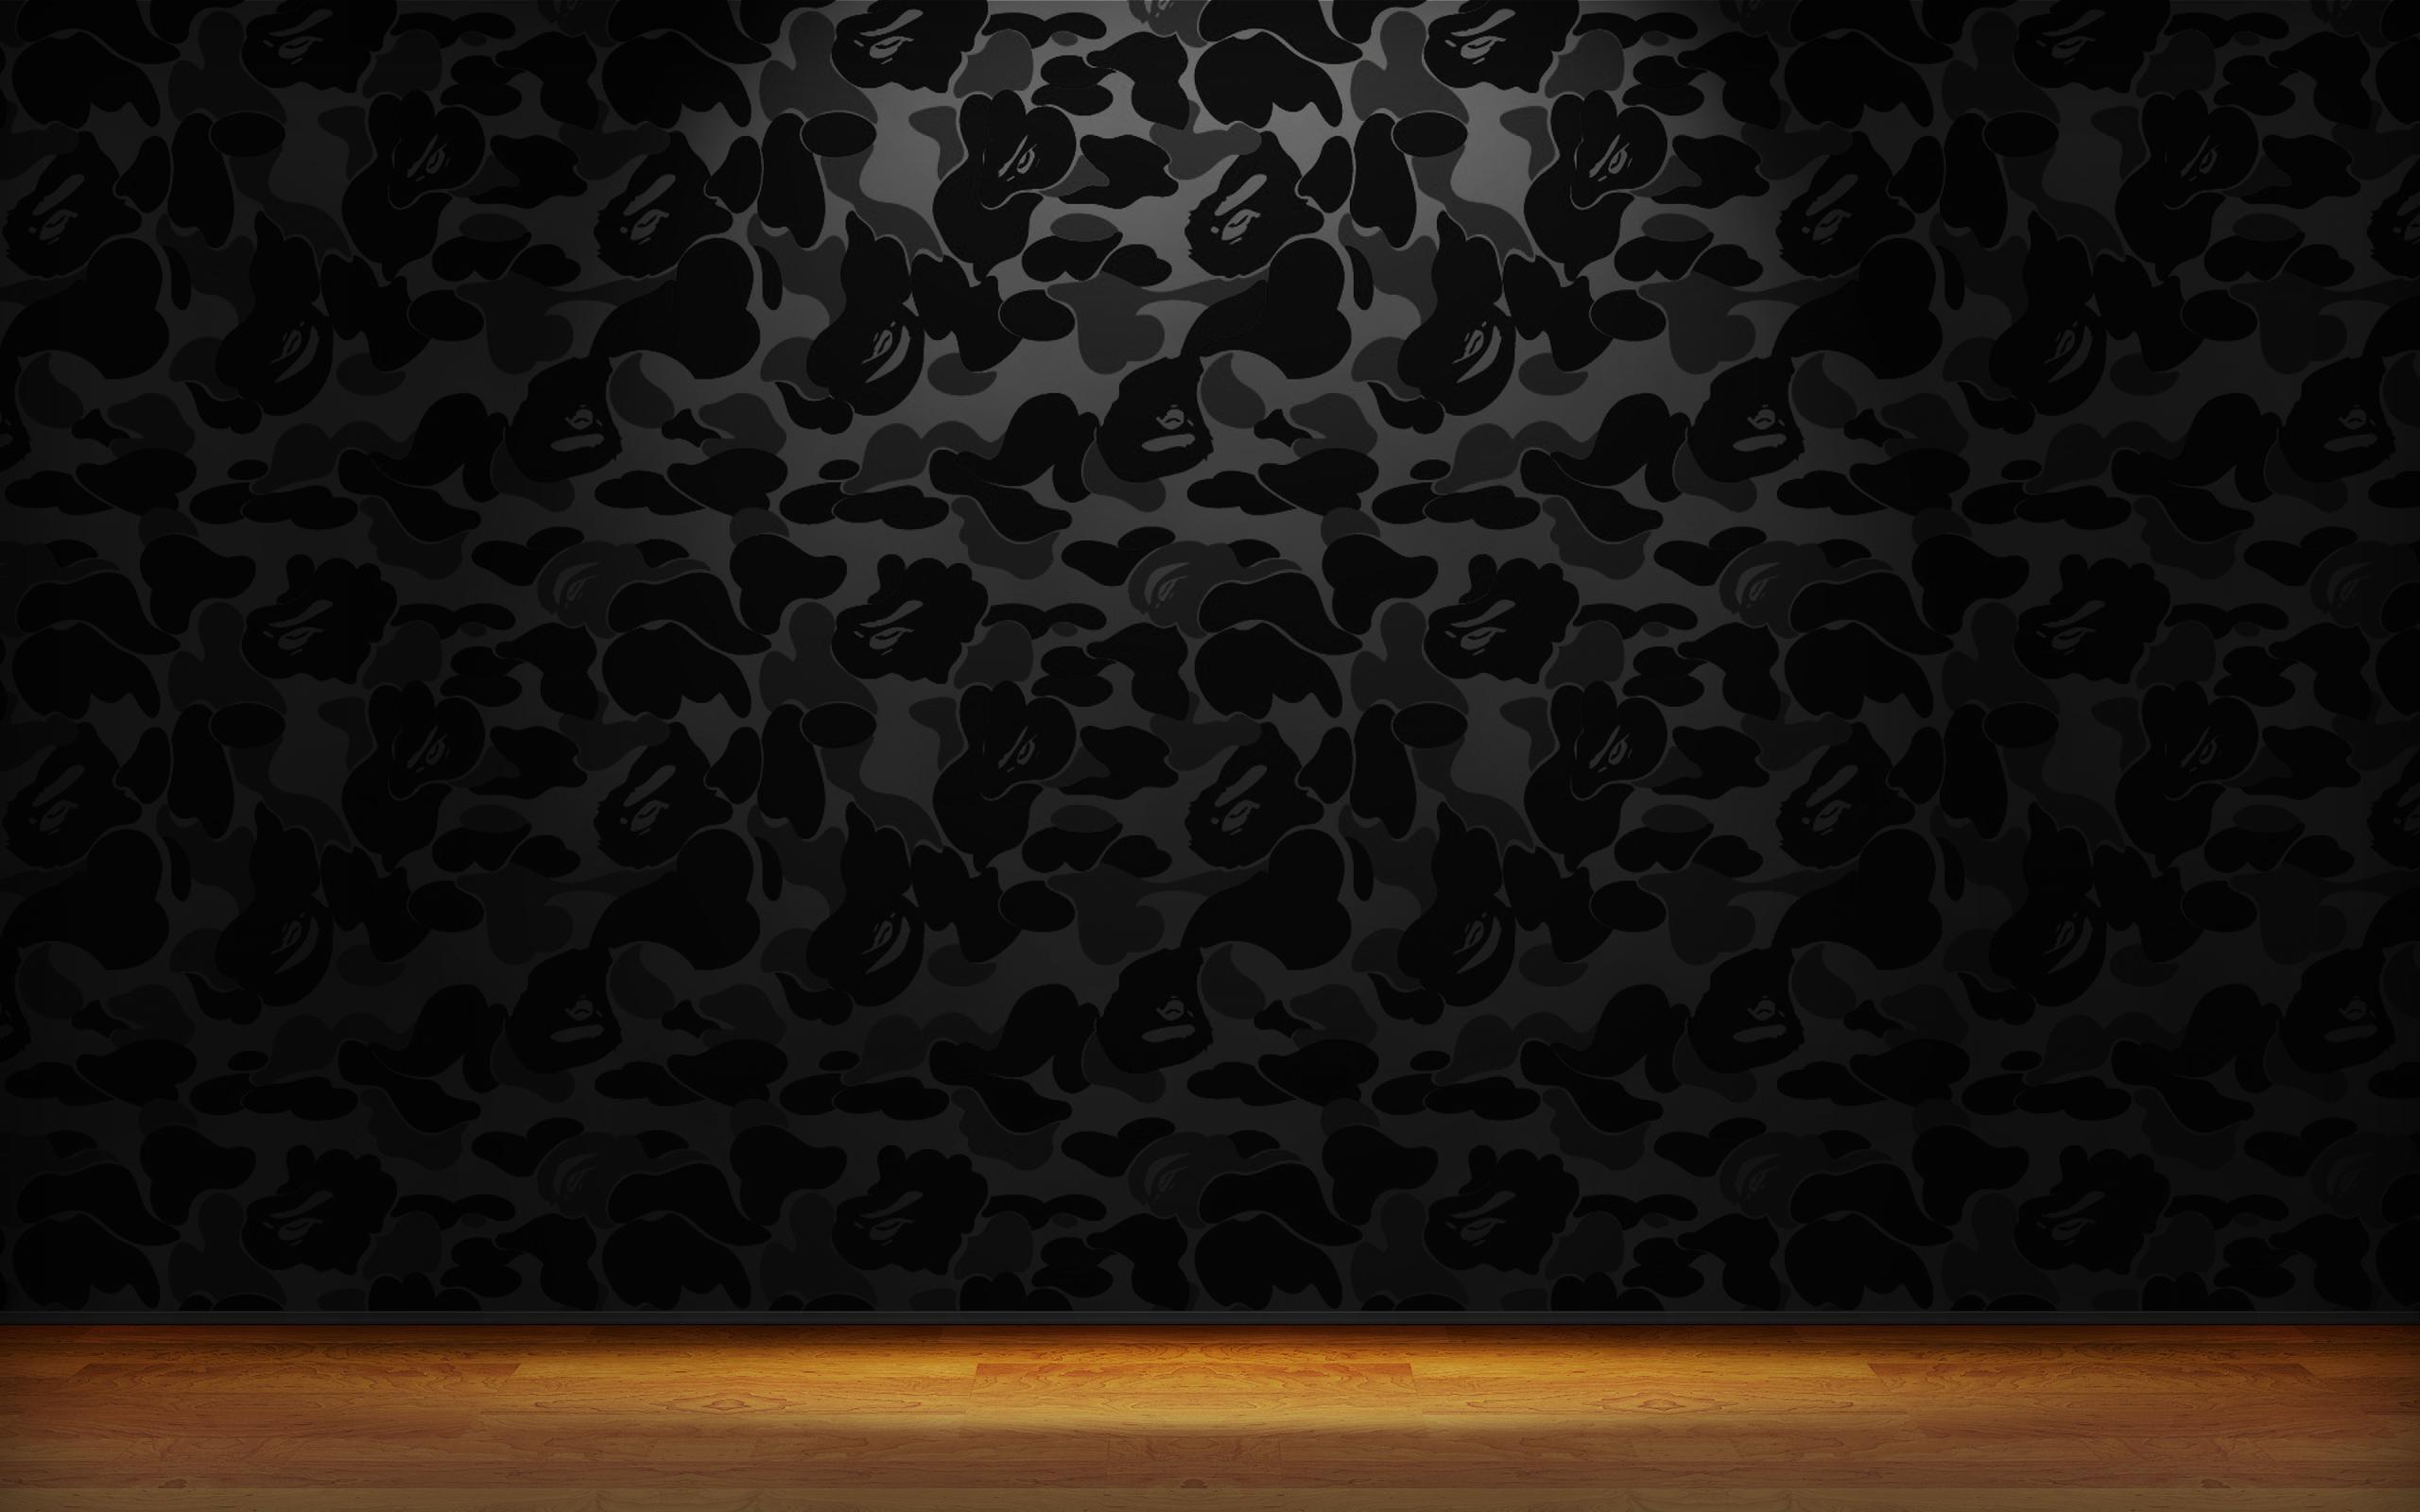 Bape Wallpaper Bape wallpaper bape wallpaper 2560x1600